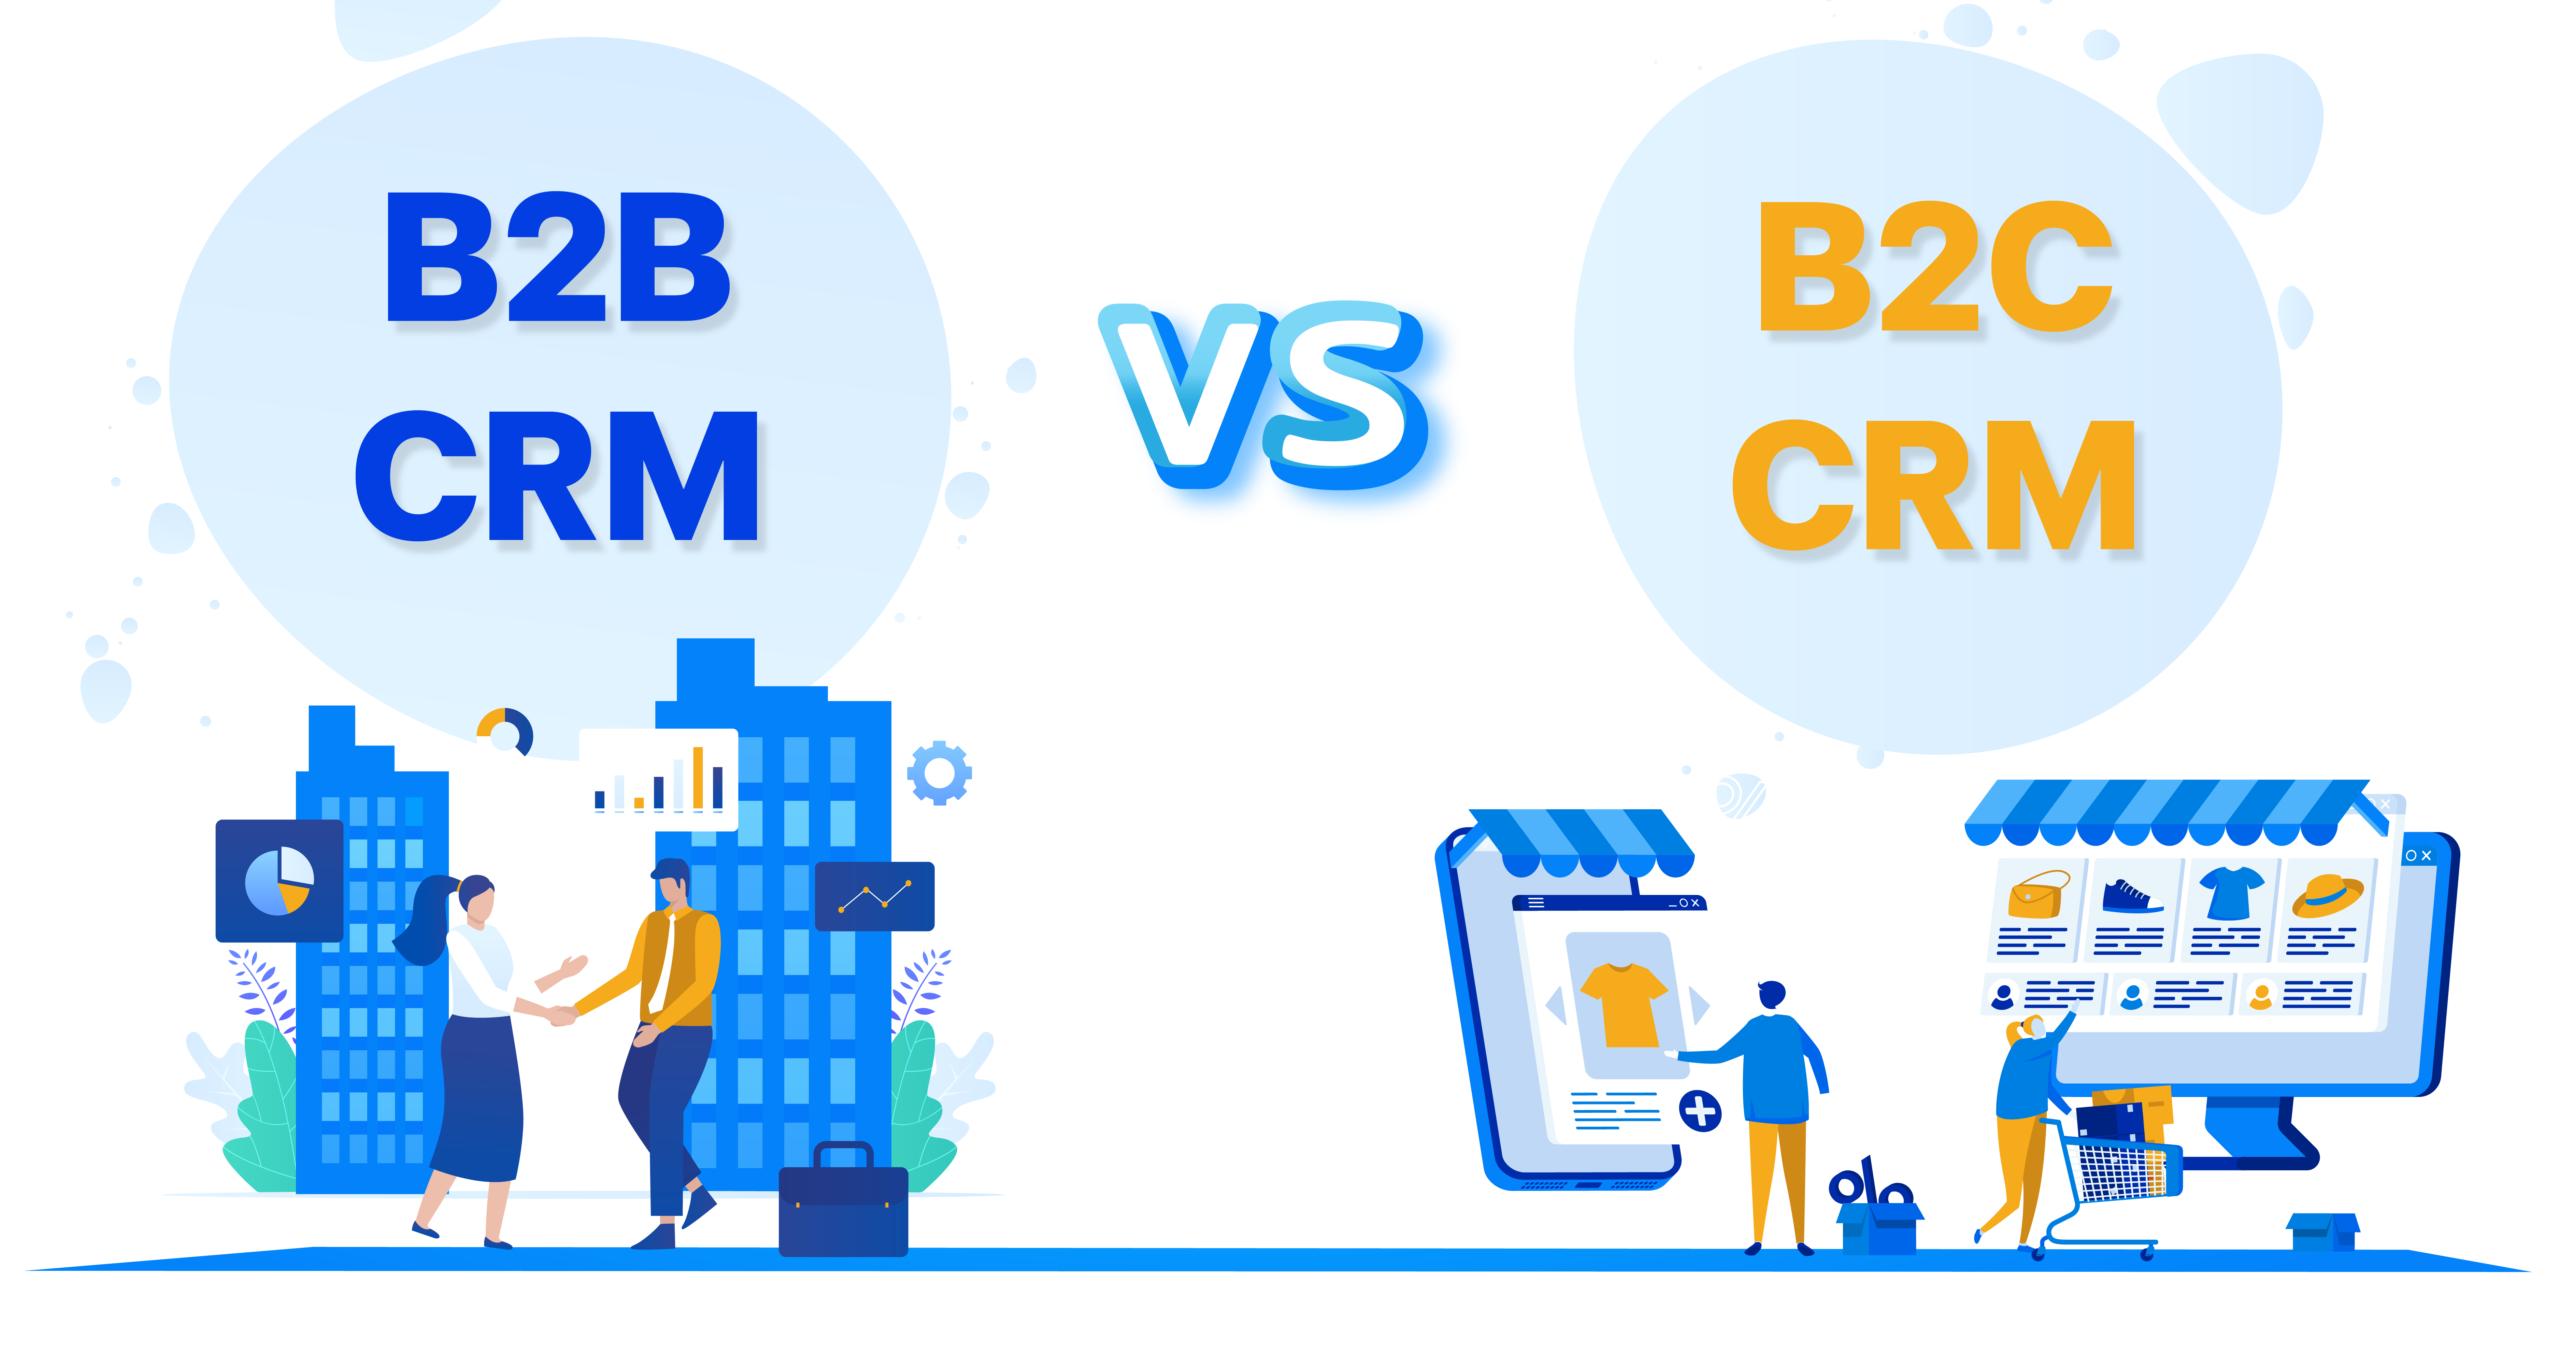 B2B CRM and B2C CRM